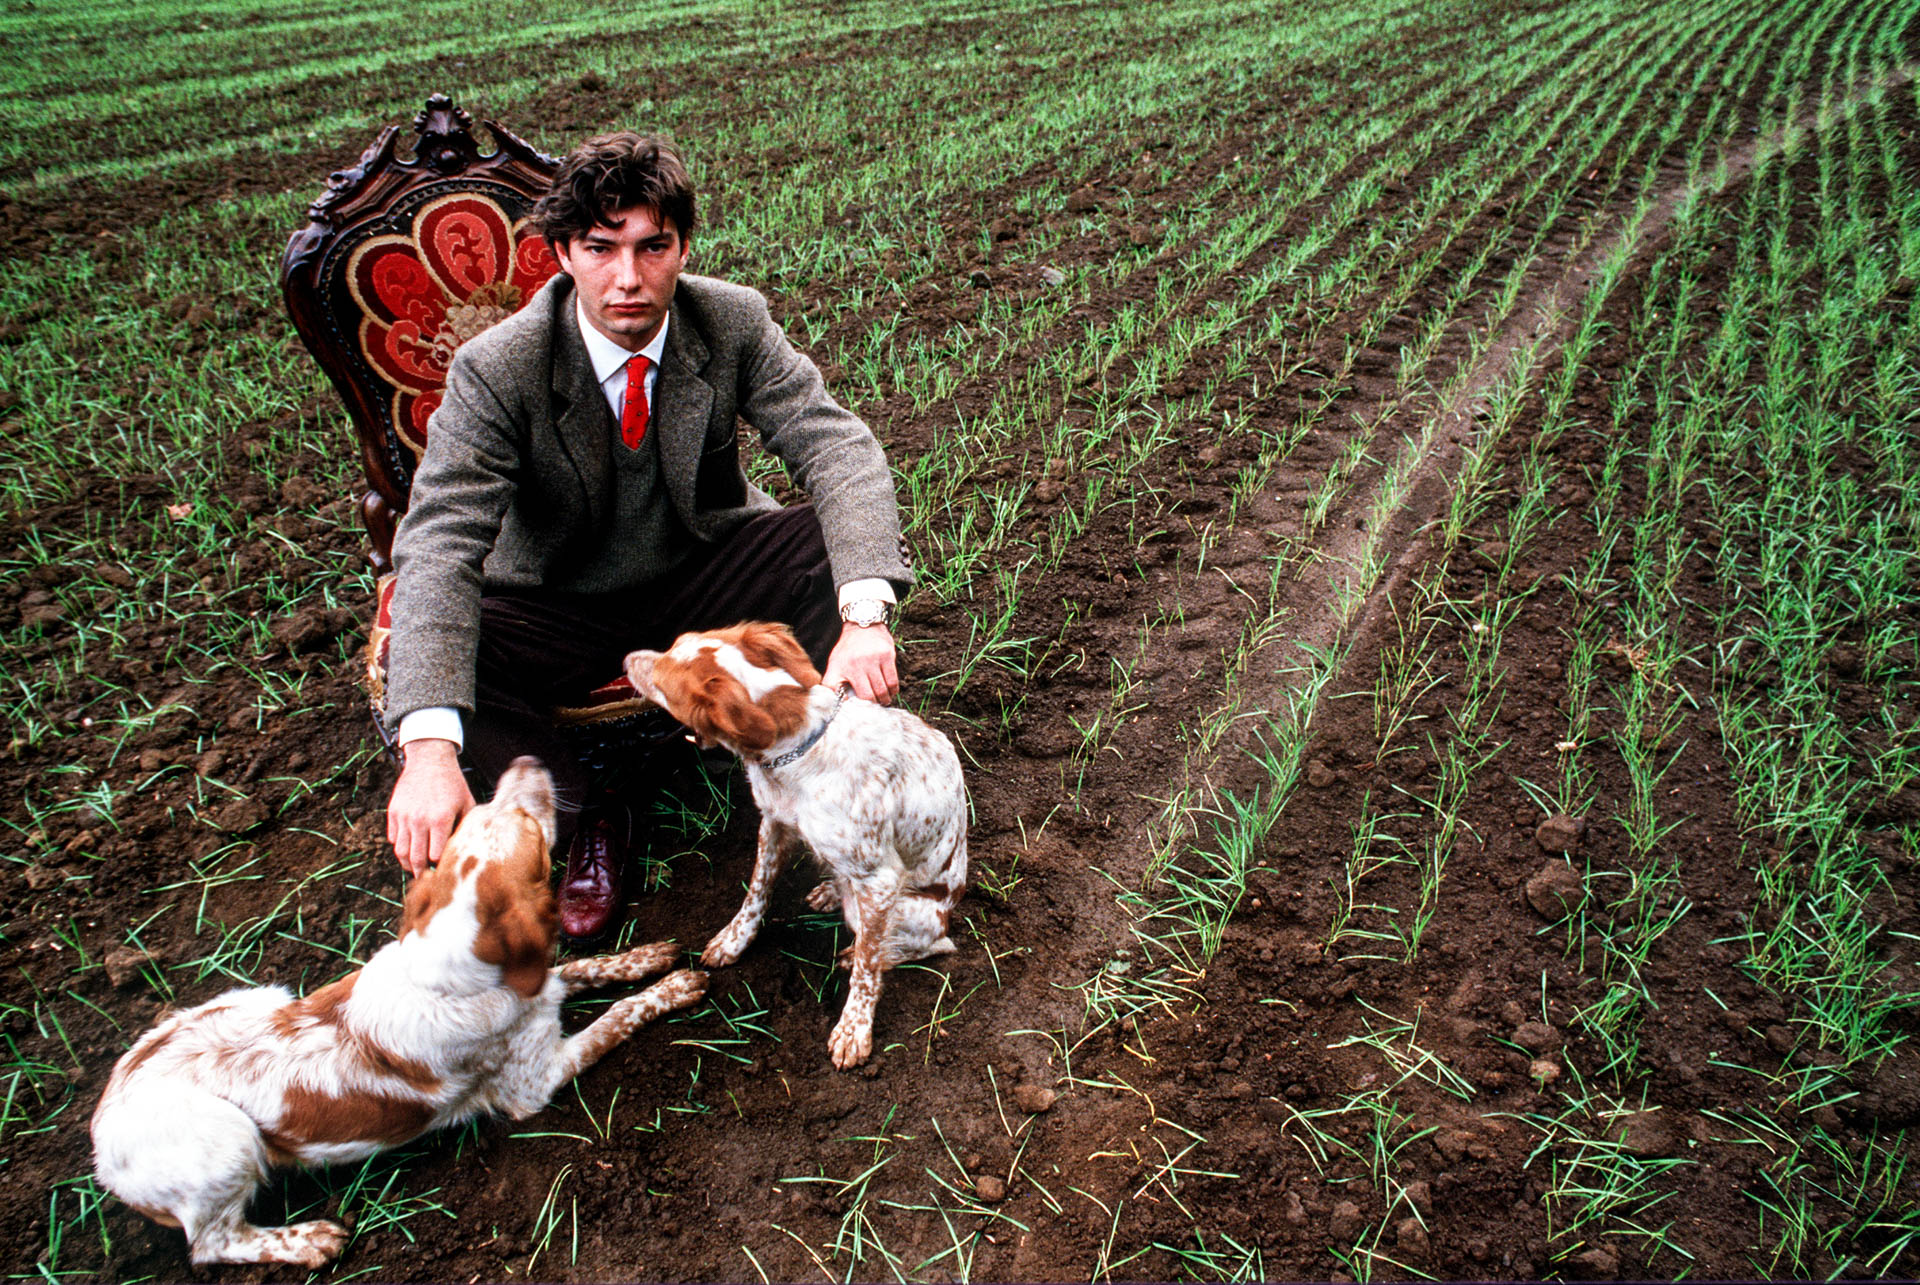 Rome, Italy - October 1987 Prince Odescalchi Federico and his Breton spaniels on his land at Bracciano, near Rome © GIANNI GIANSANTI